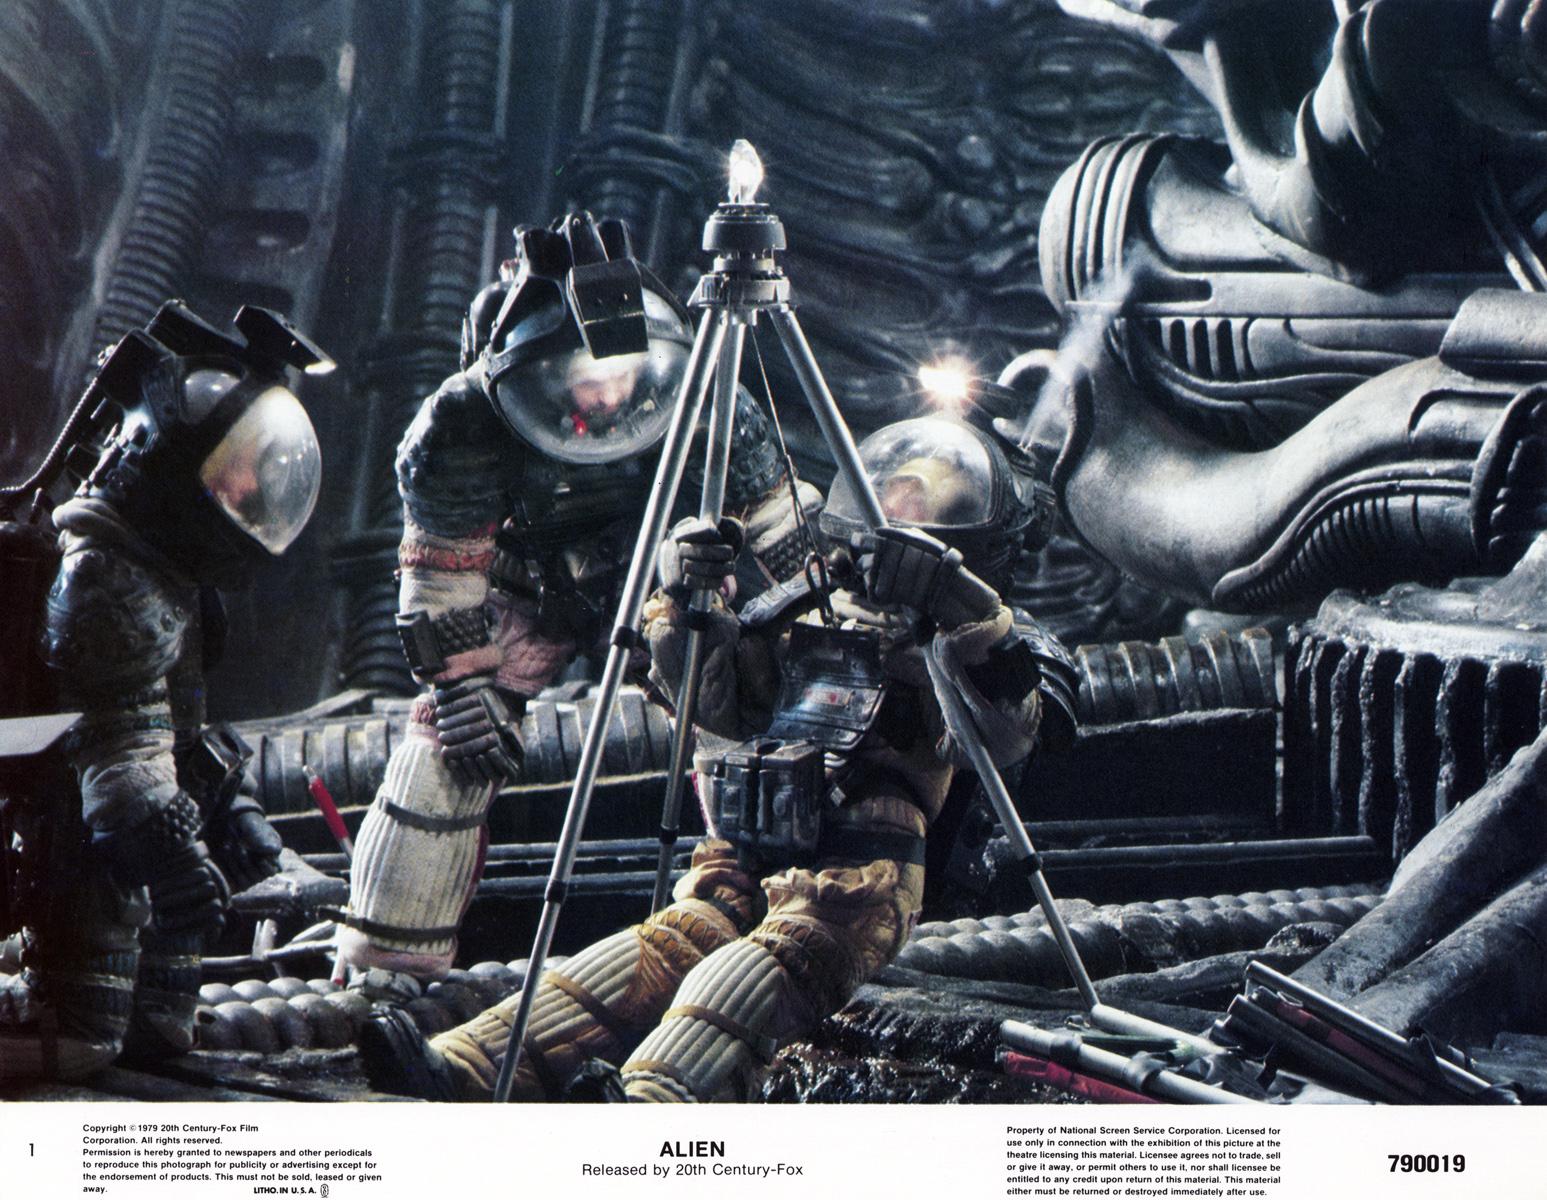 40th Anniversary of Ridley Scott's Alien: A Sci-Fi/Horror Milestone Against All Cultural Odds